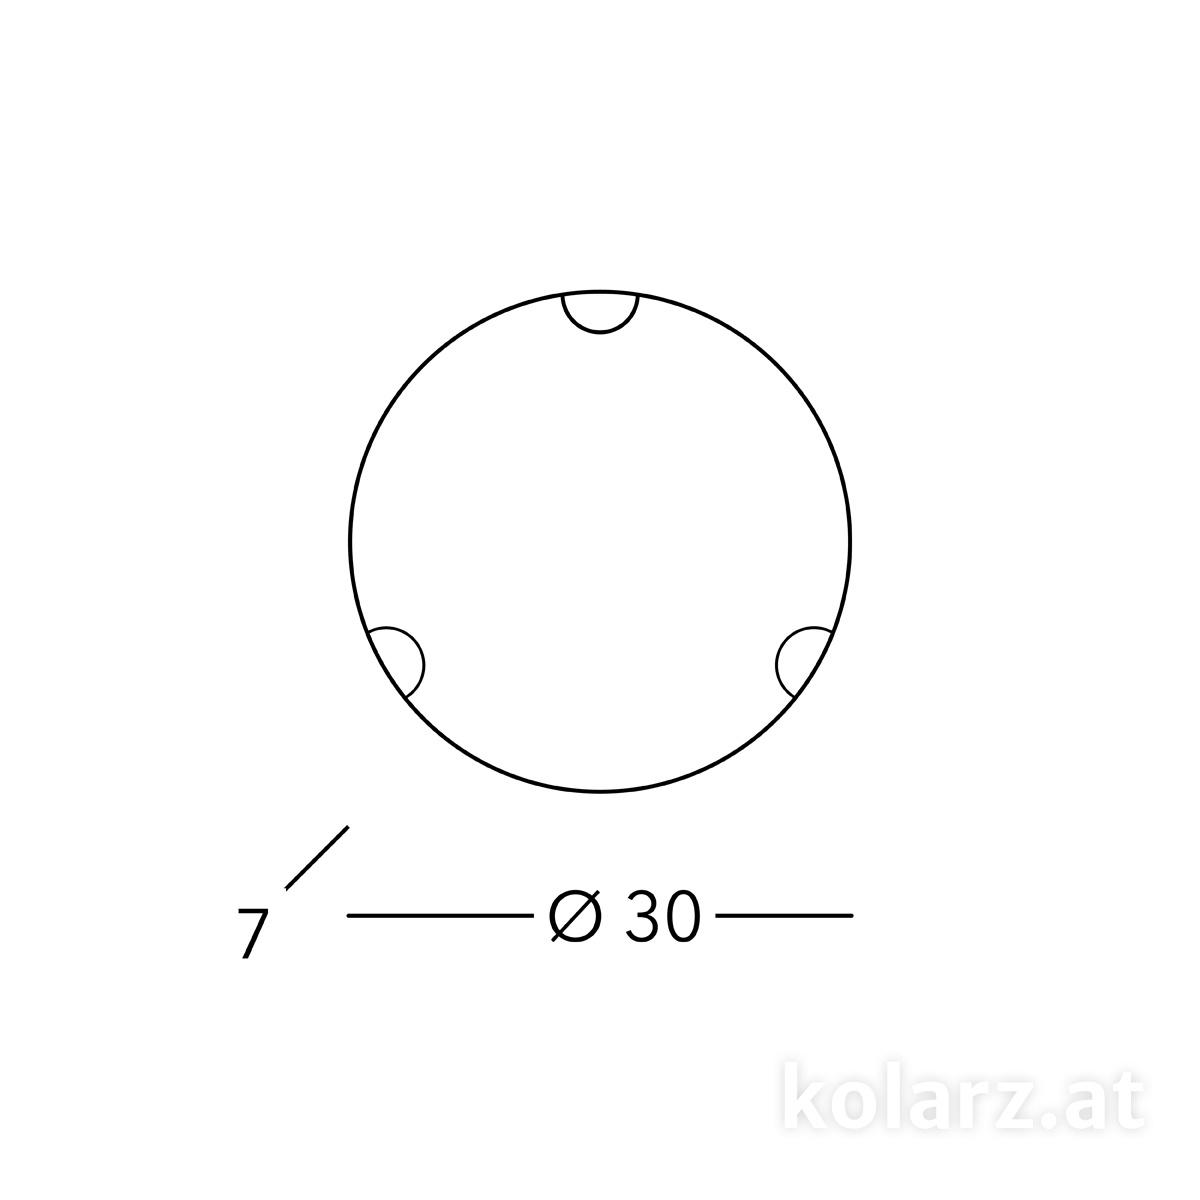 731-11-4-100-s1.jpg